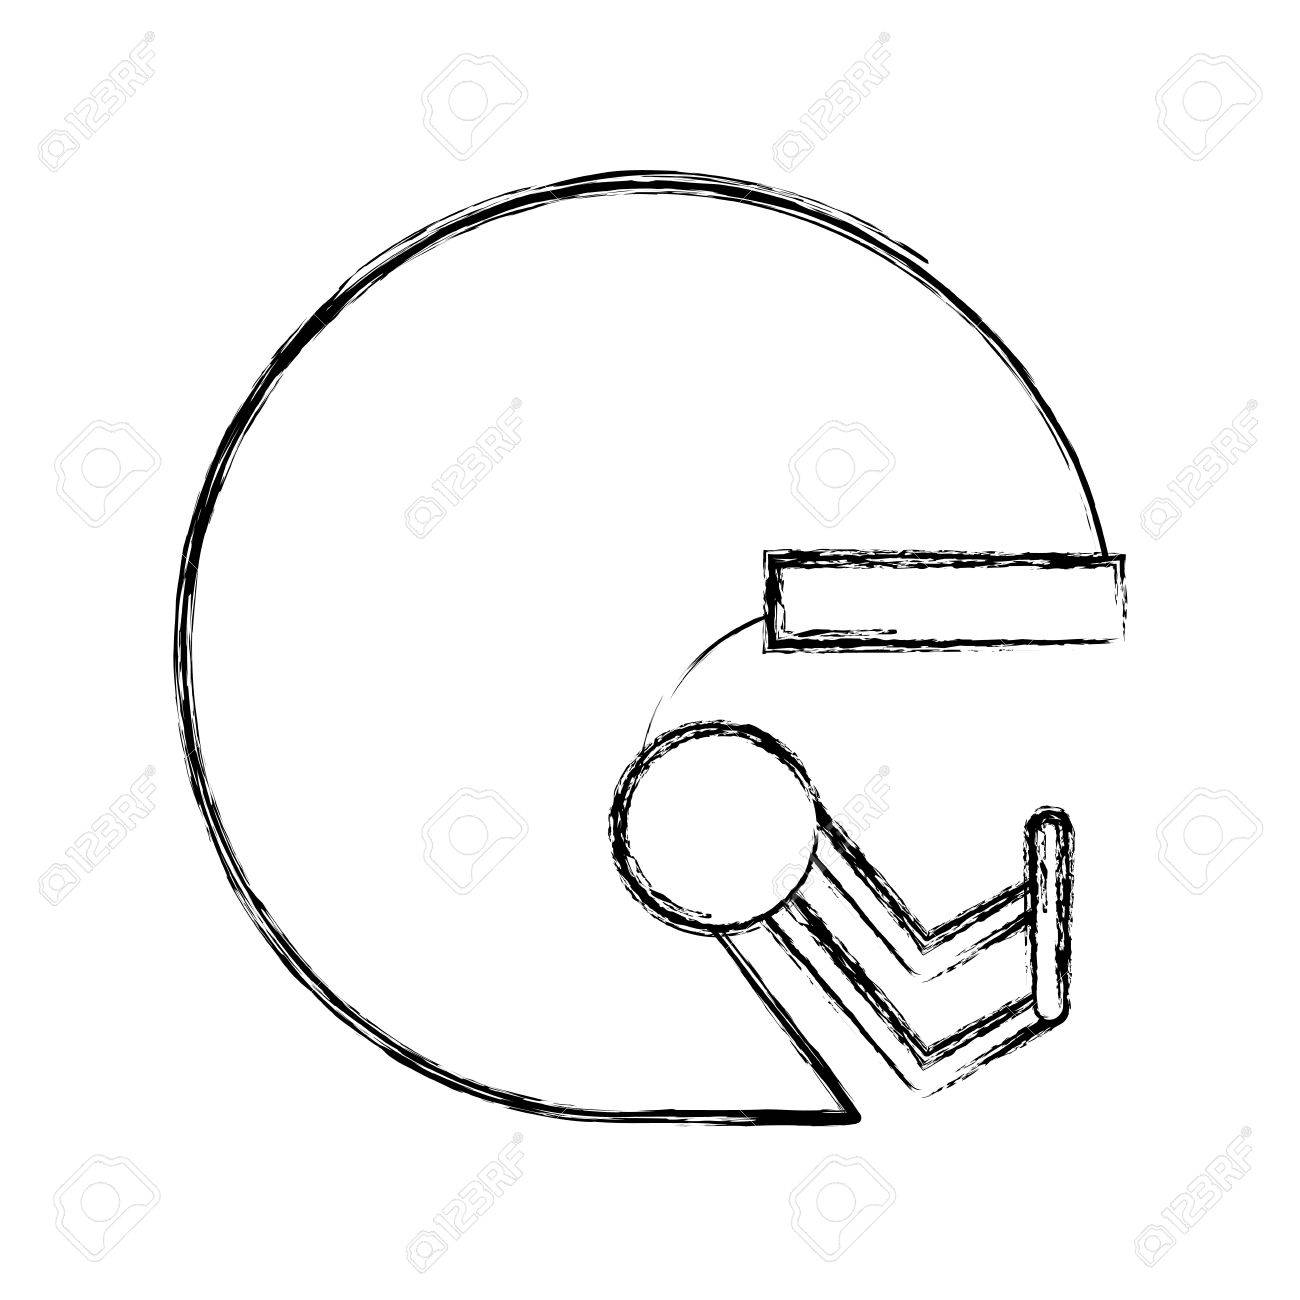 1300x1300 Cute Sketch Draw Football Helmet Cartoon Vector Graphic Design